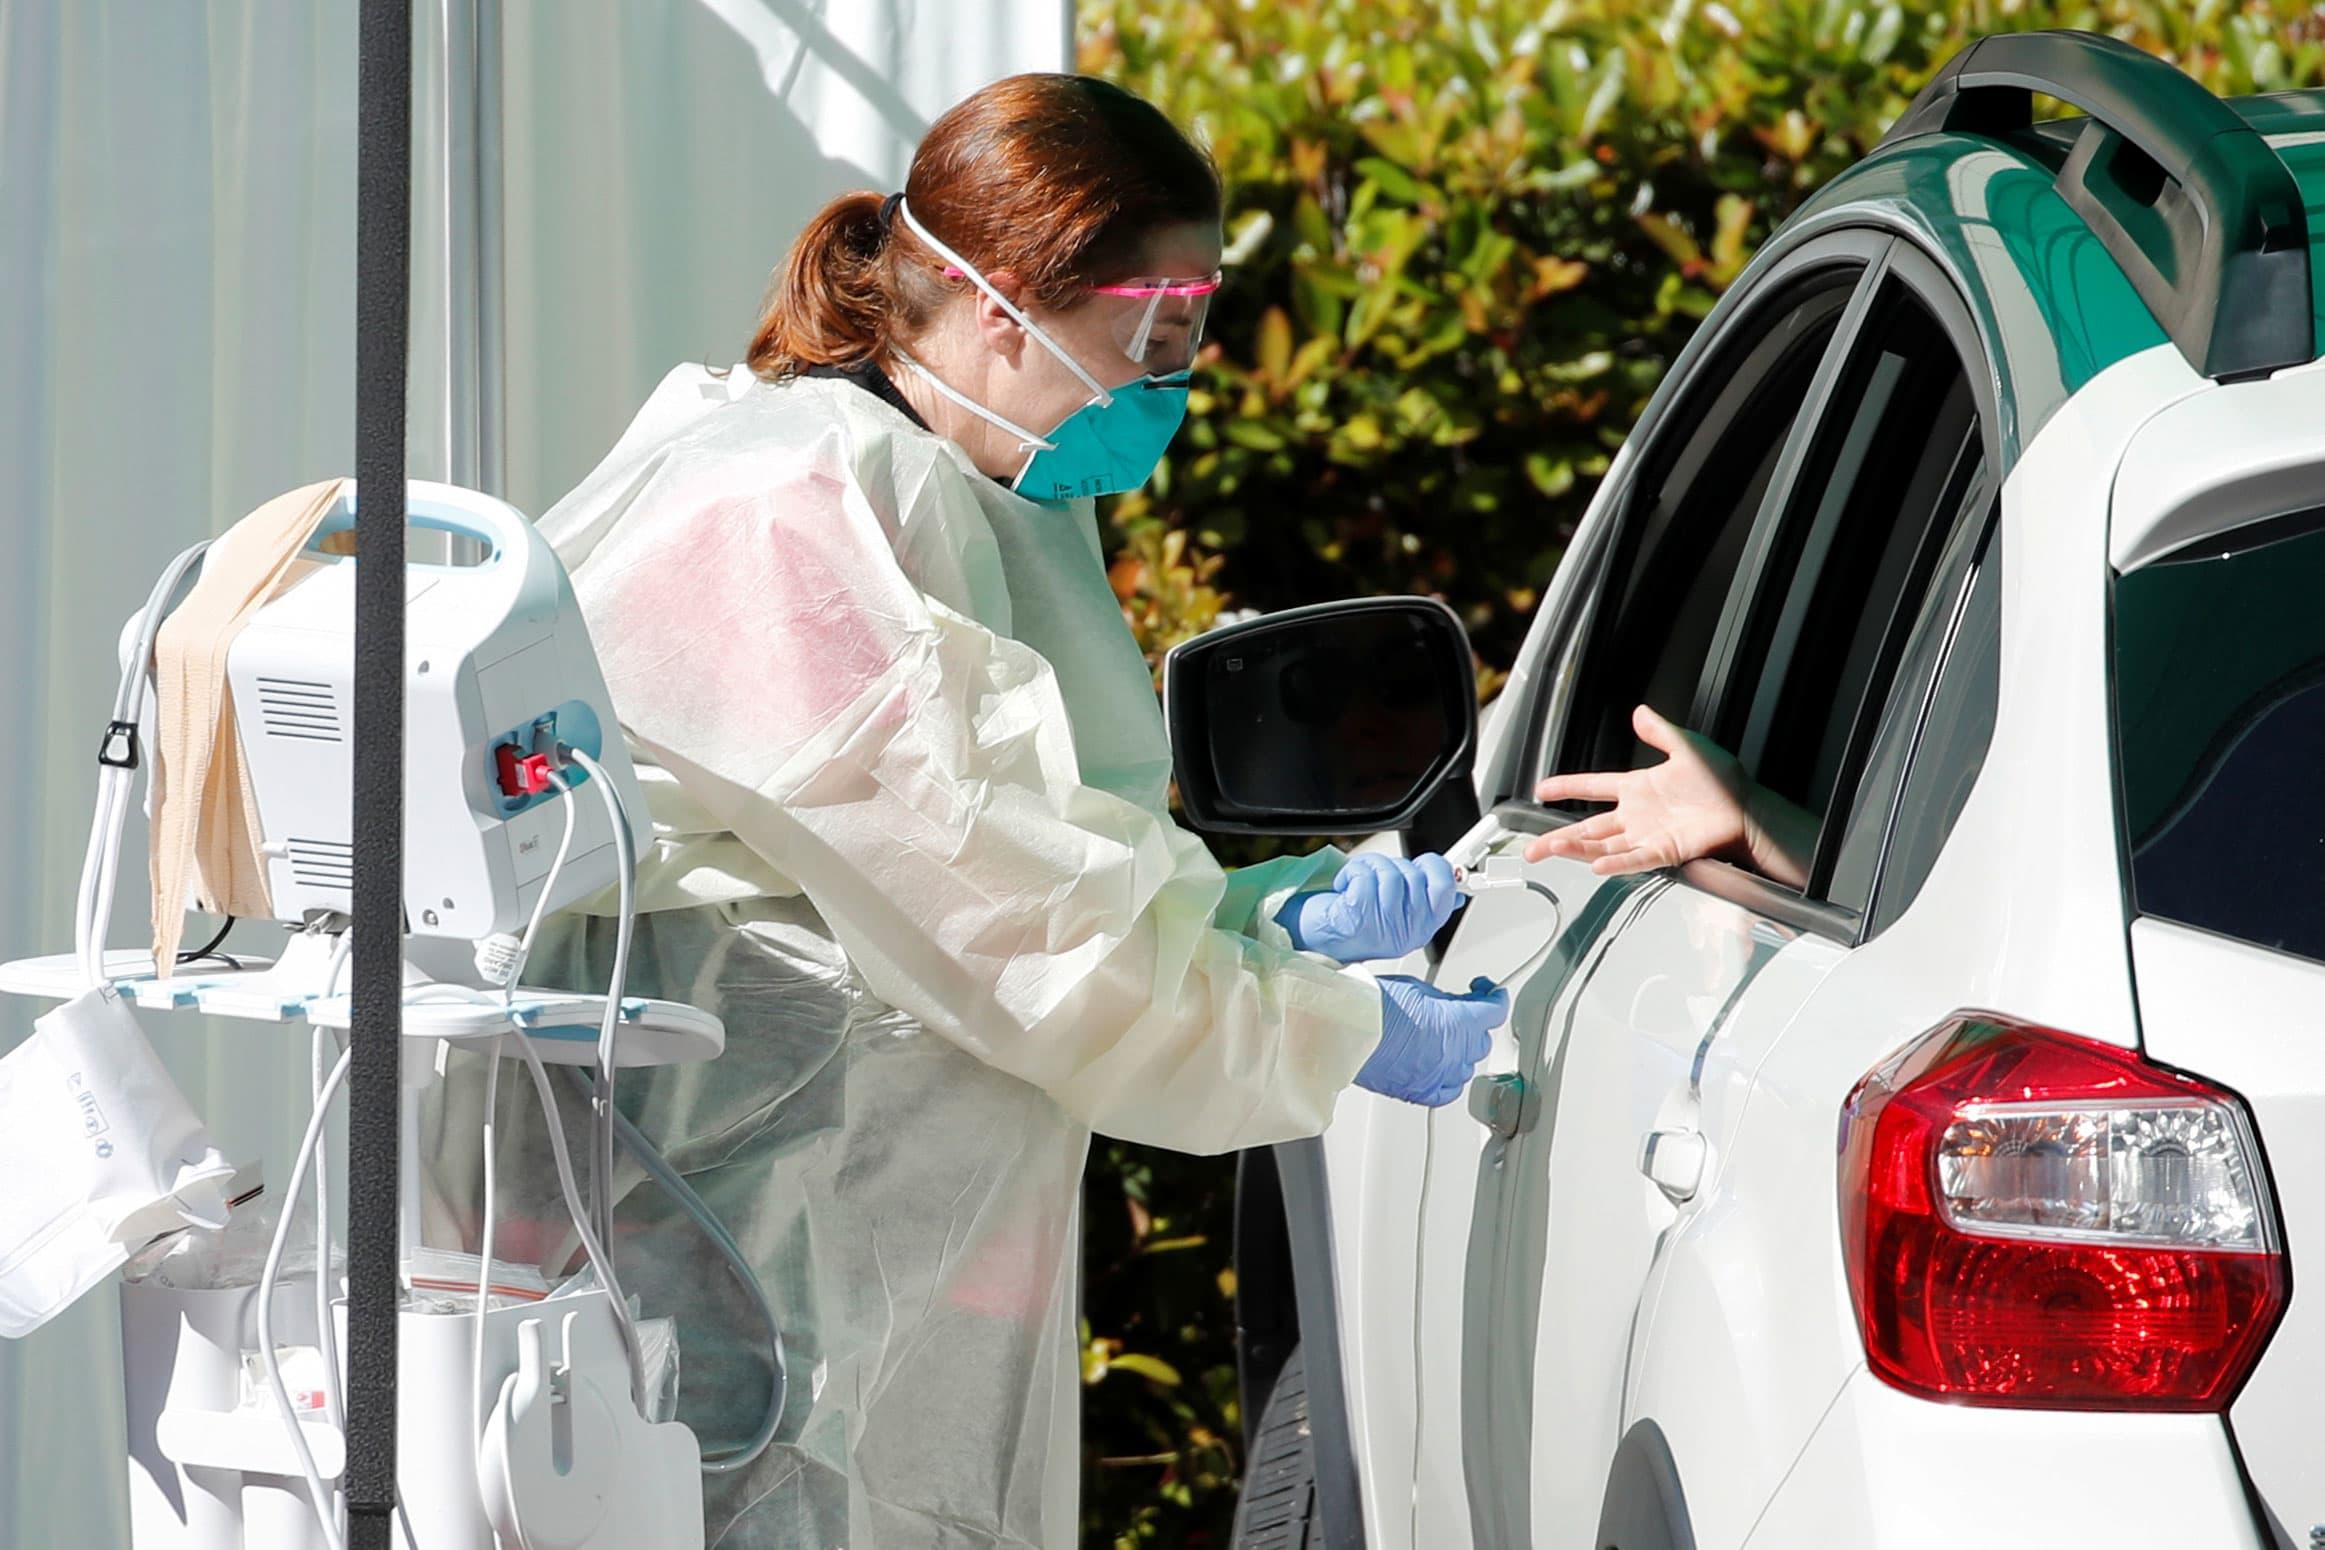 San Diego hospital prepares for 'slow-moving tsunami' of coronavirus cases as supplies run short